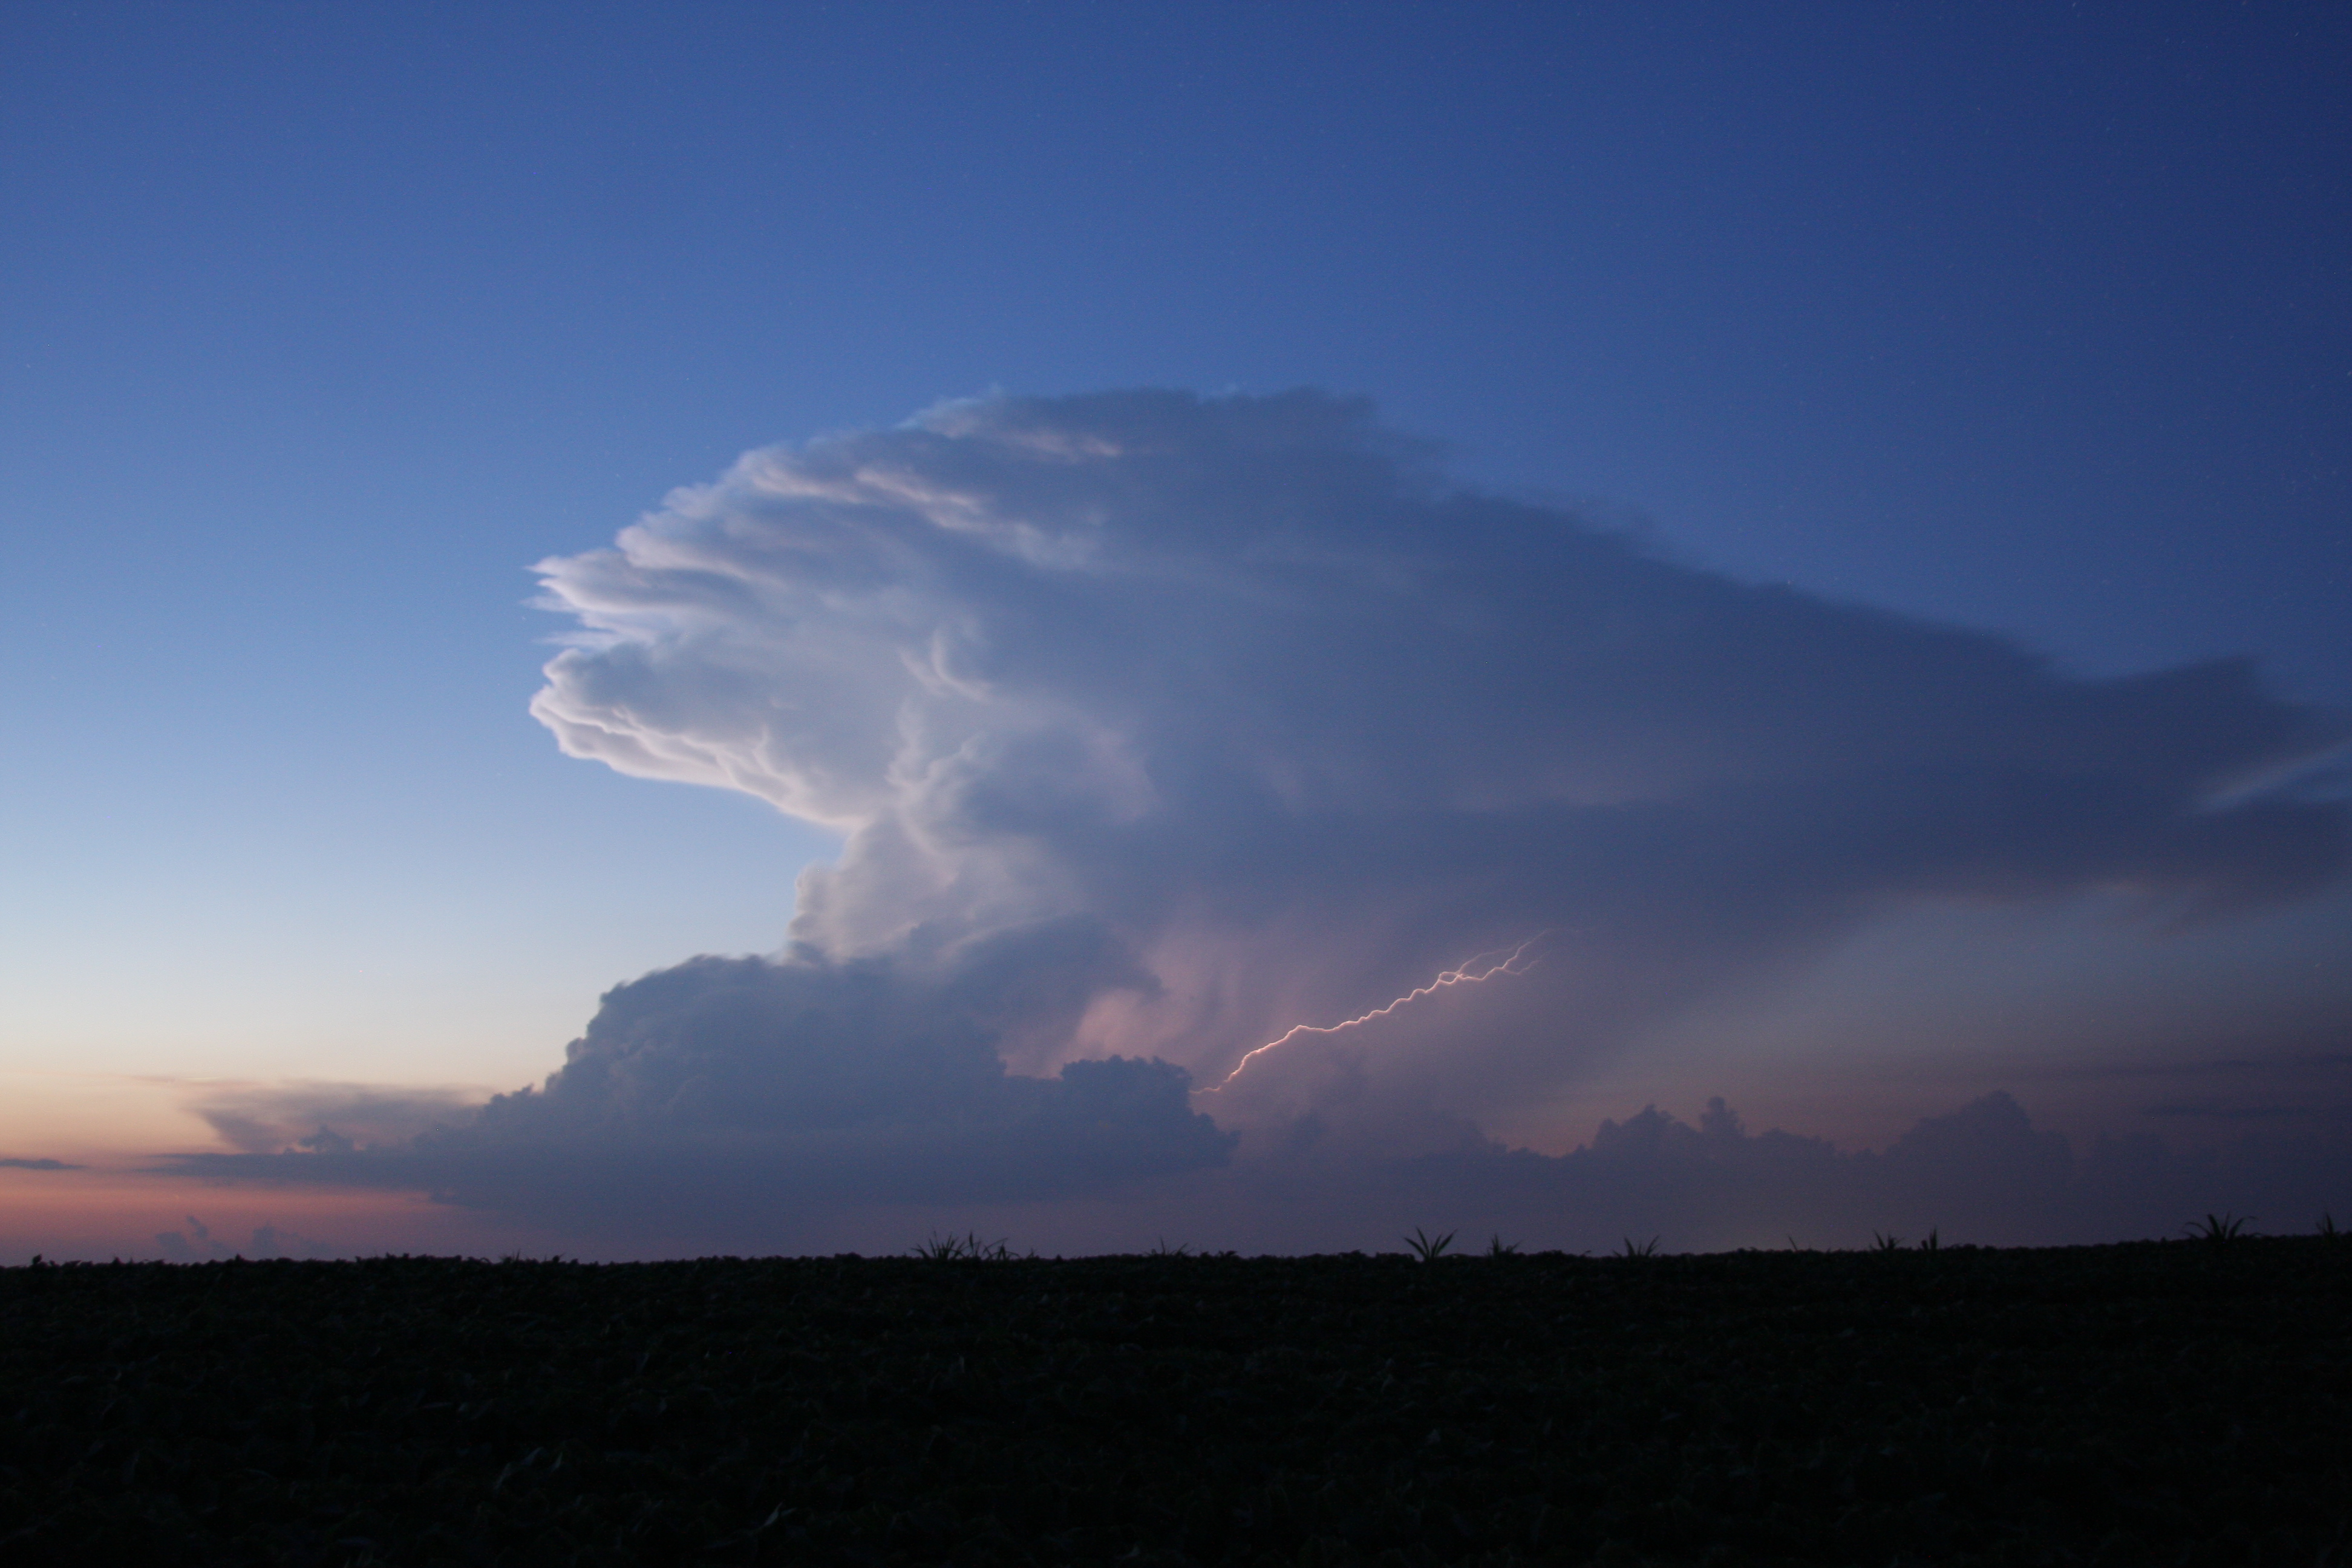 thunderhead clouds wallpaper - photo #20